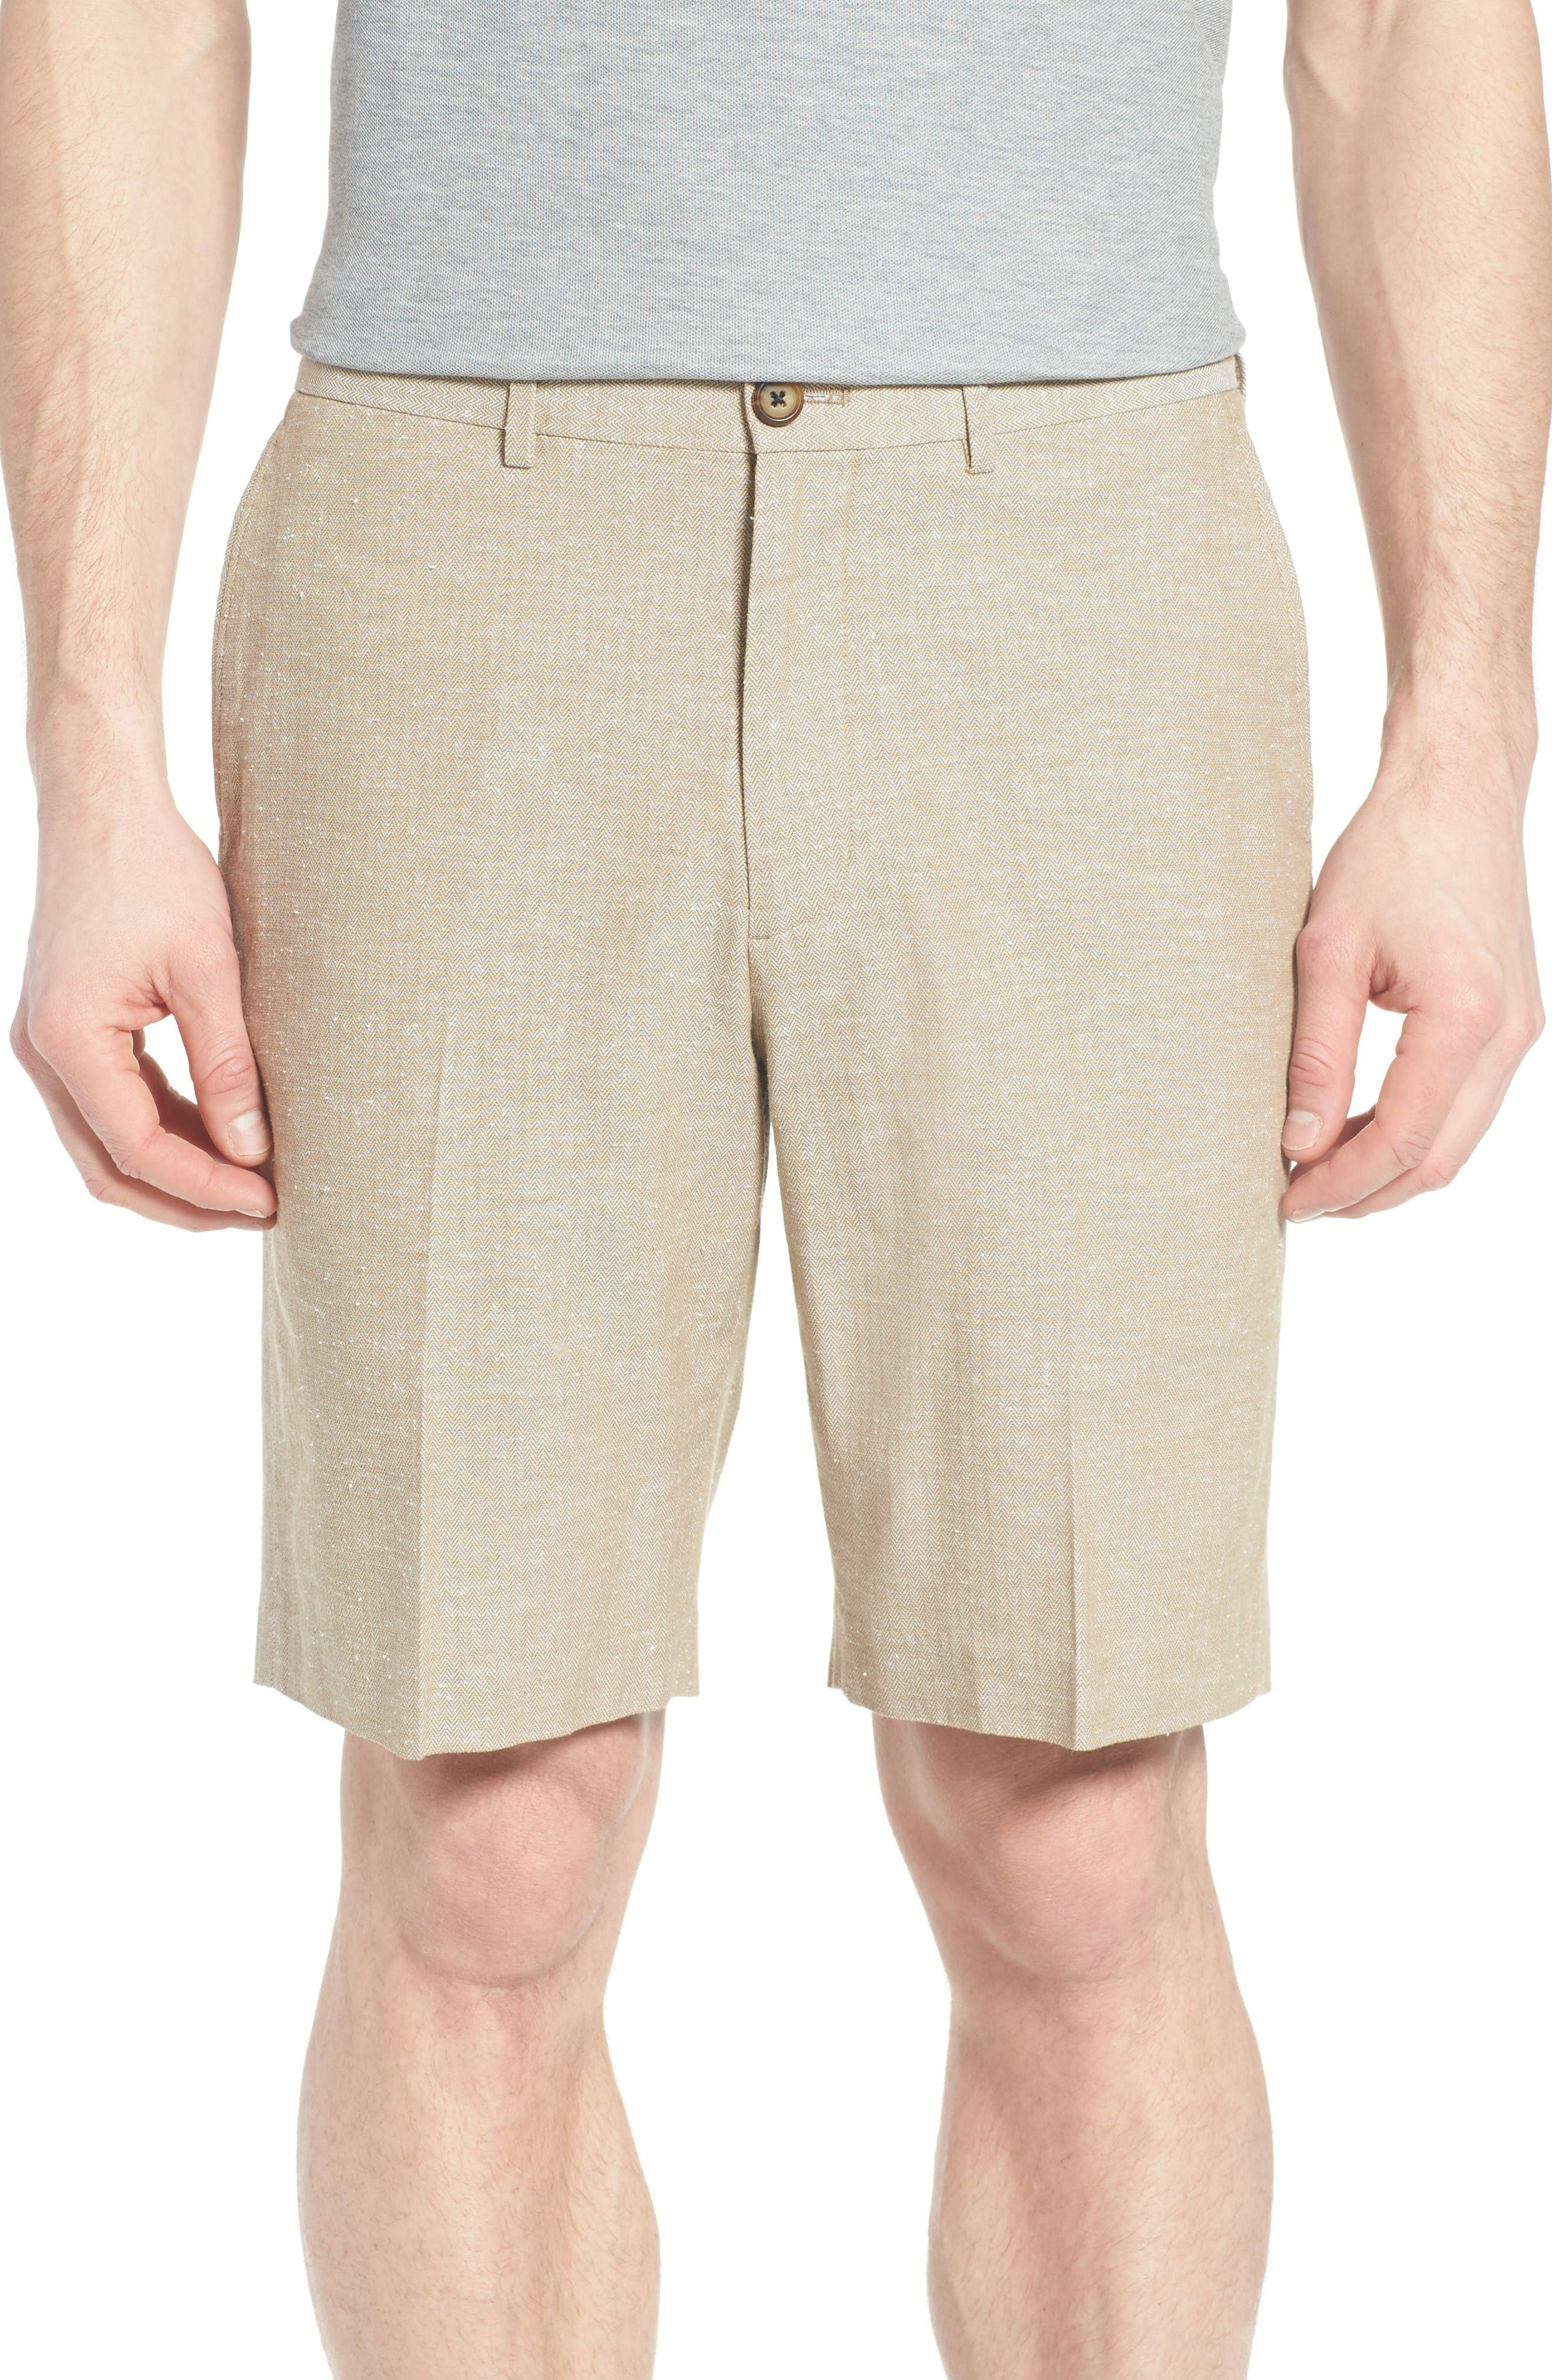 John W. Nordstrom® Herringbone Flat Front Shorts